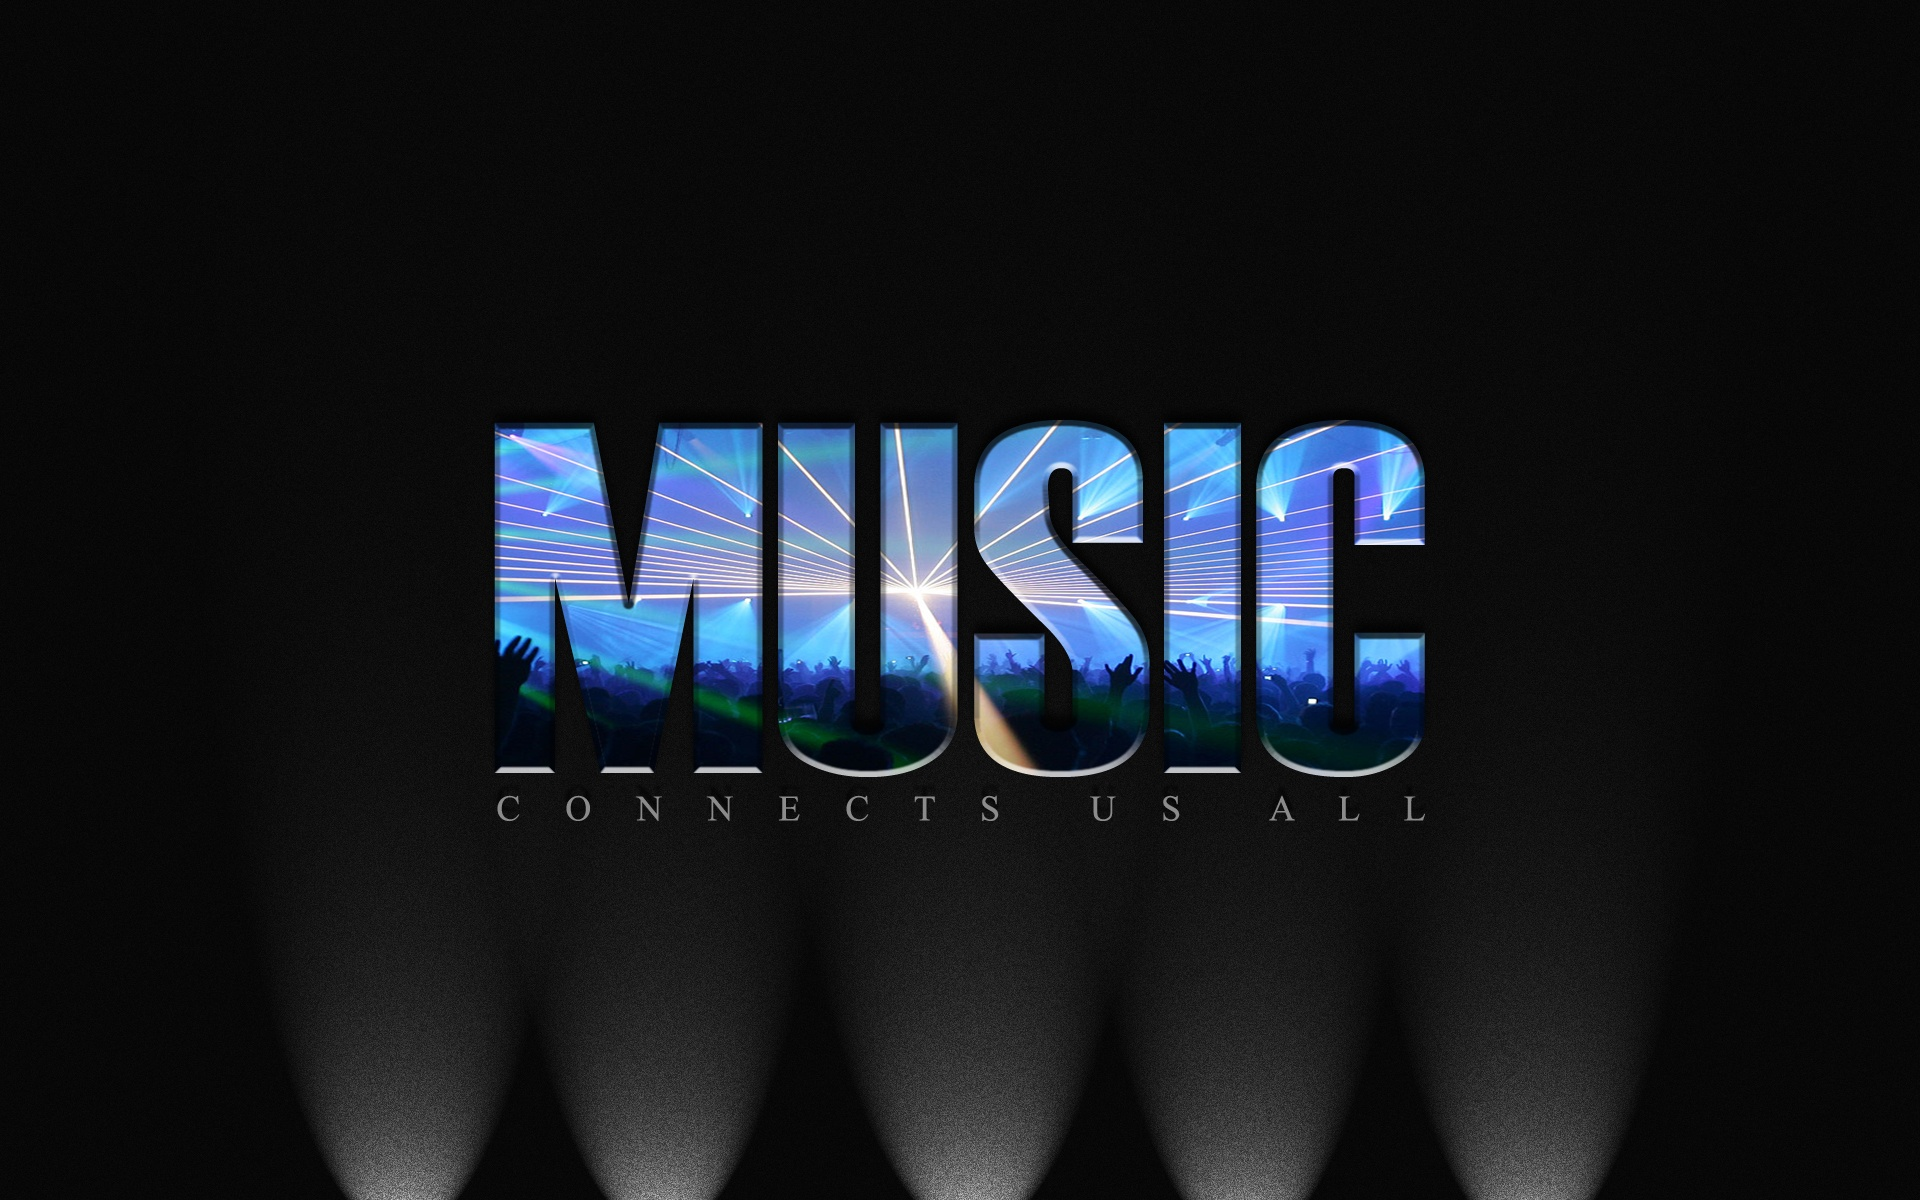 Music Wallpaper For Windows Users: Música Full HD Fondo De Pantalla And Fondo De Escritorio